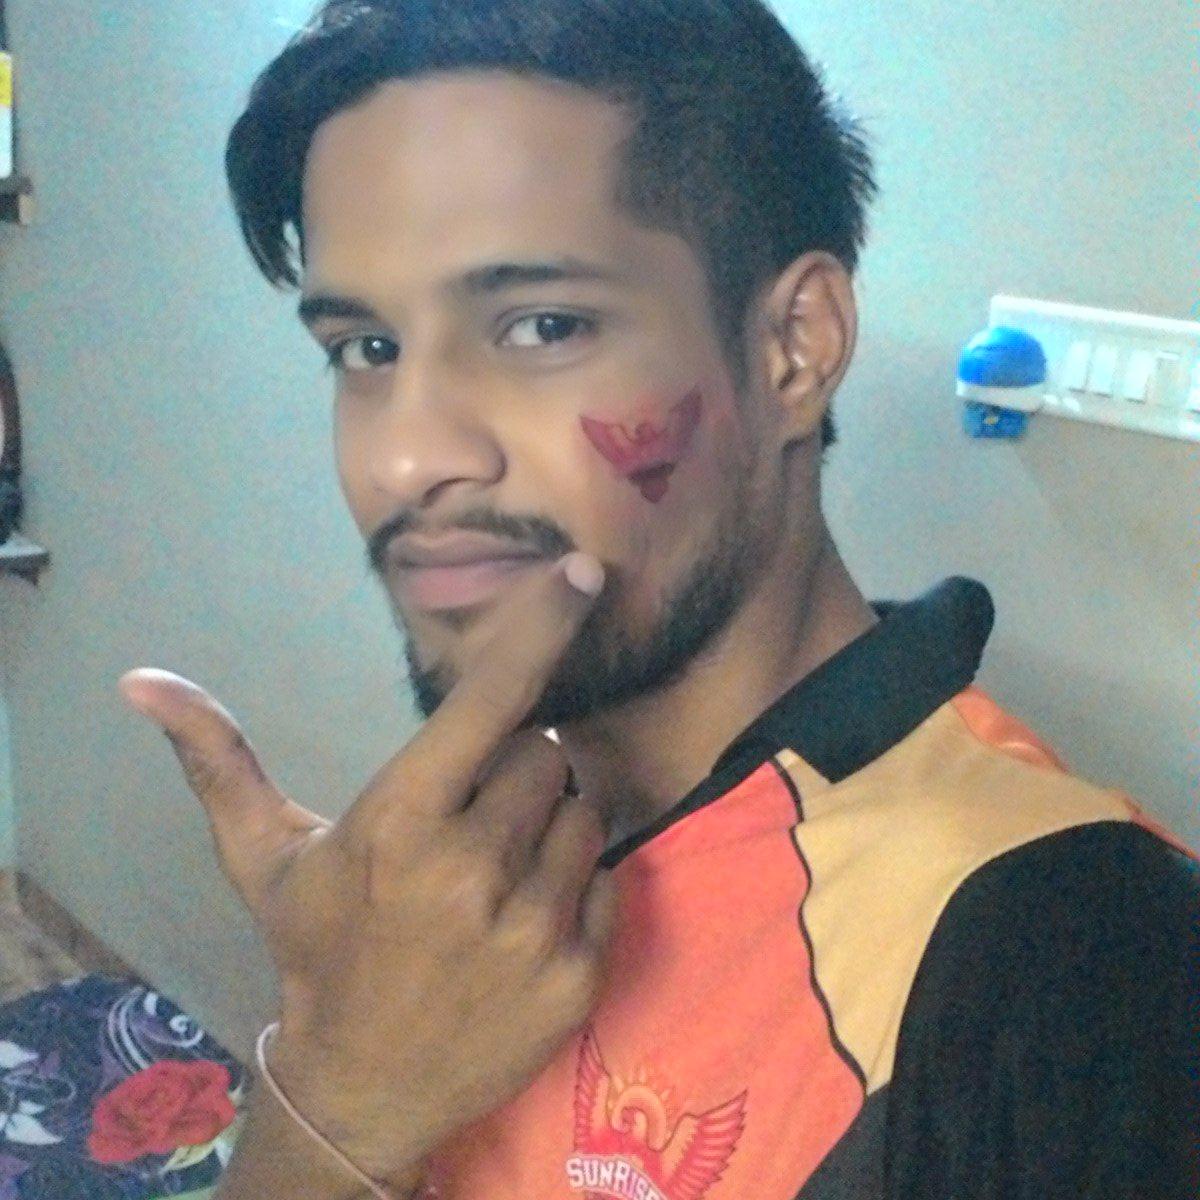 @bharatpeindia #TeamBharatPe  #cricketgoodies  #CheerForTeamBharatPe #ContestAlert #Win #cricketstars #Cricket